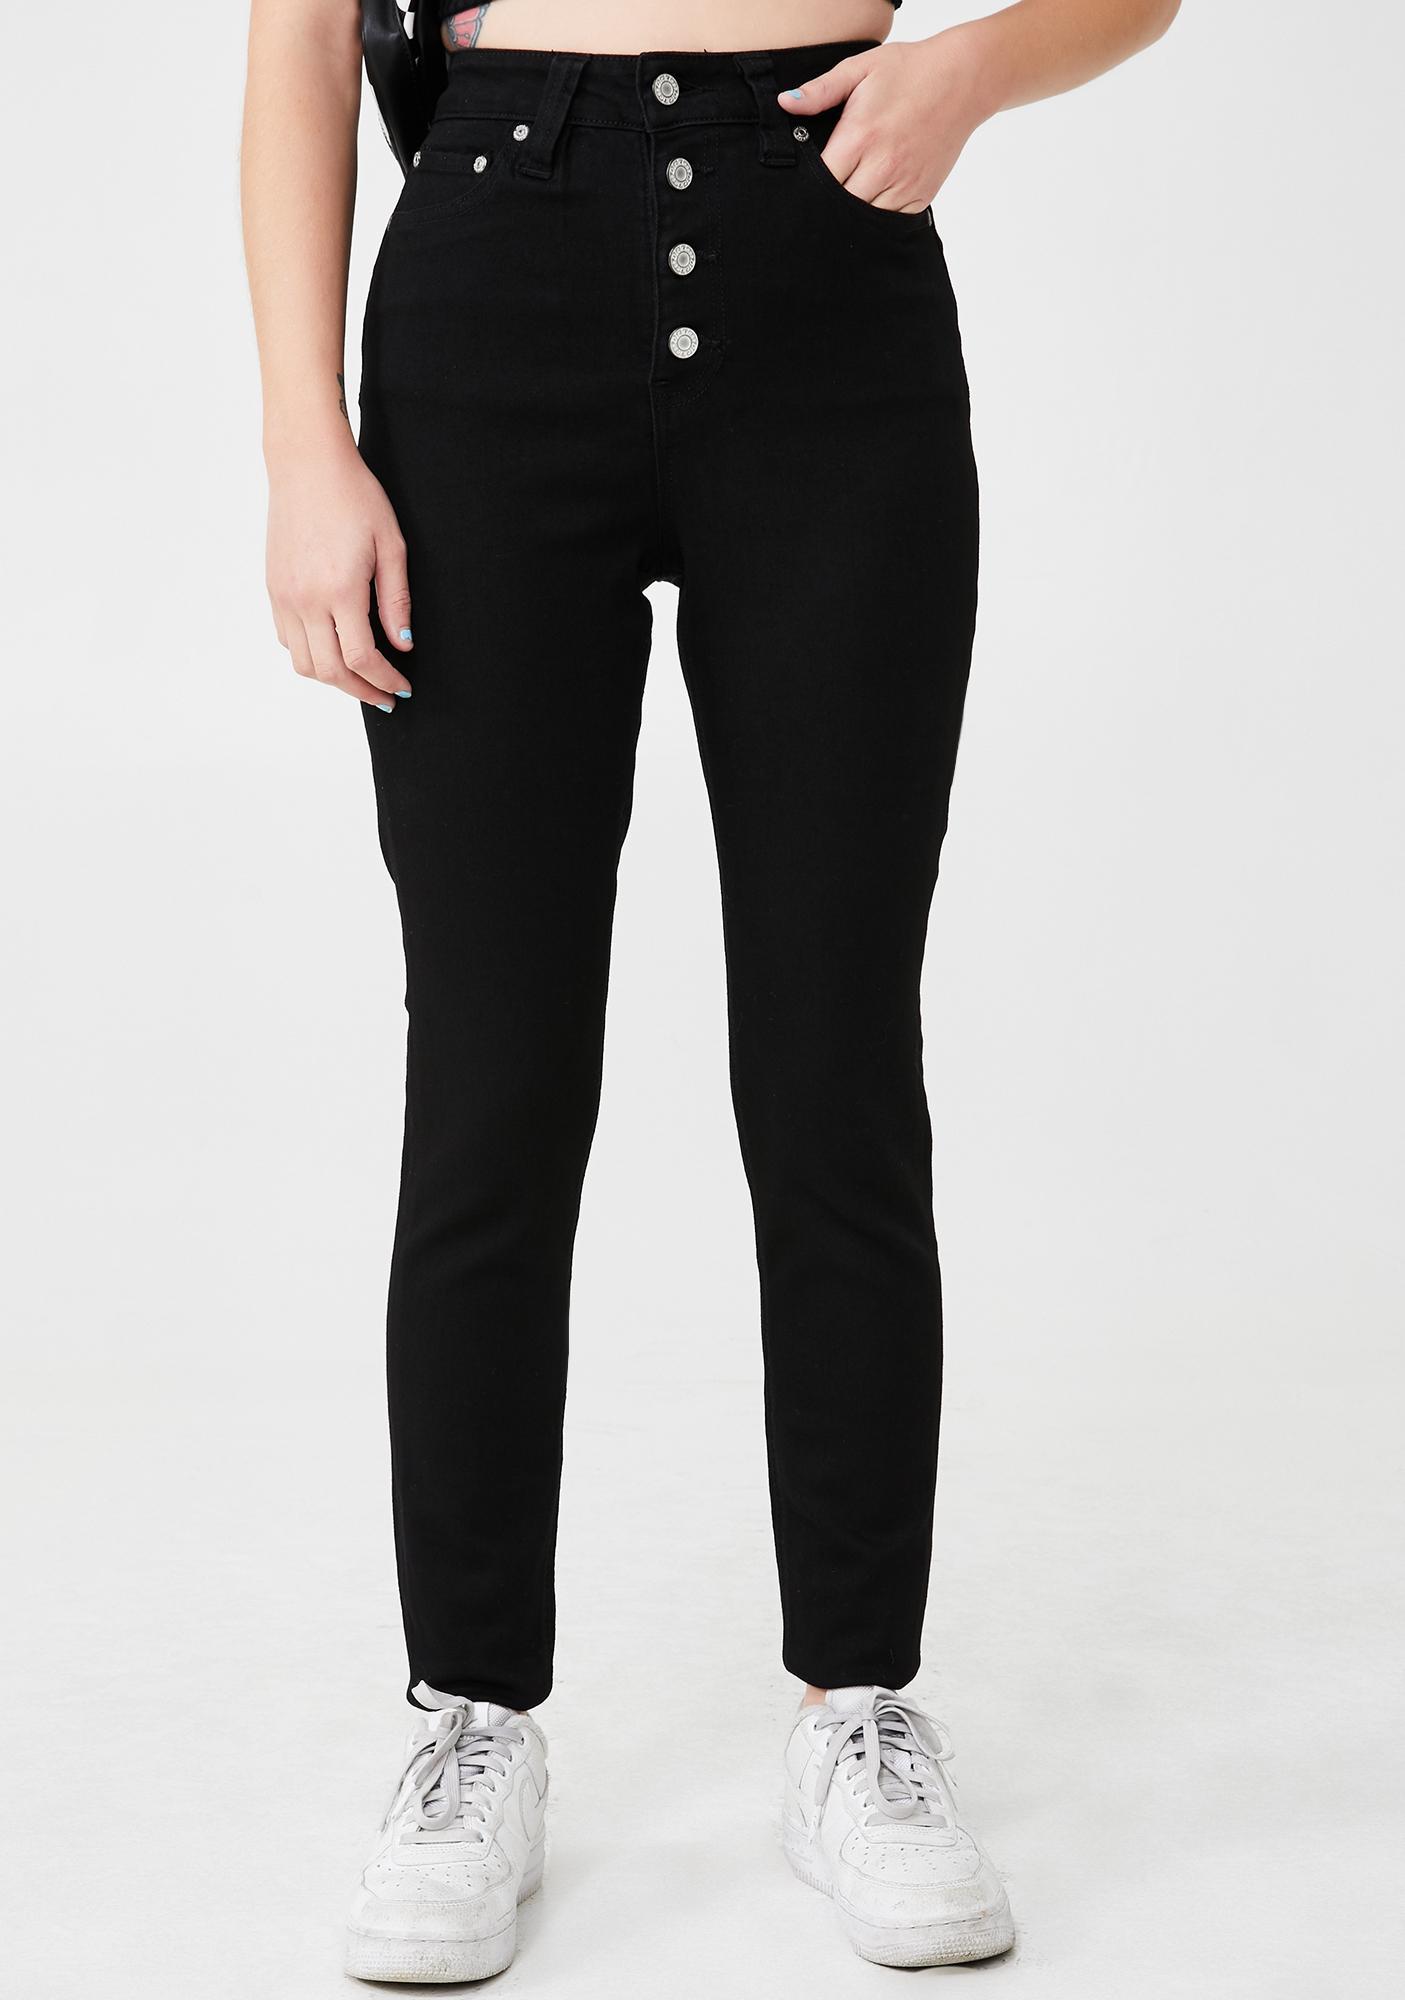 Dickies Girl Black 5 Pocket High Rise Skinny Jeans